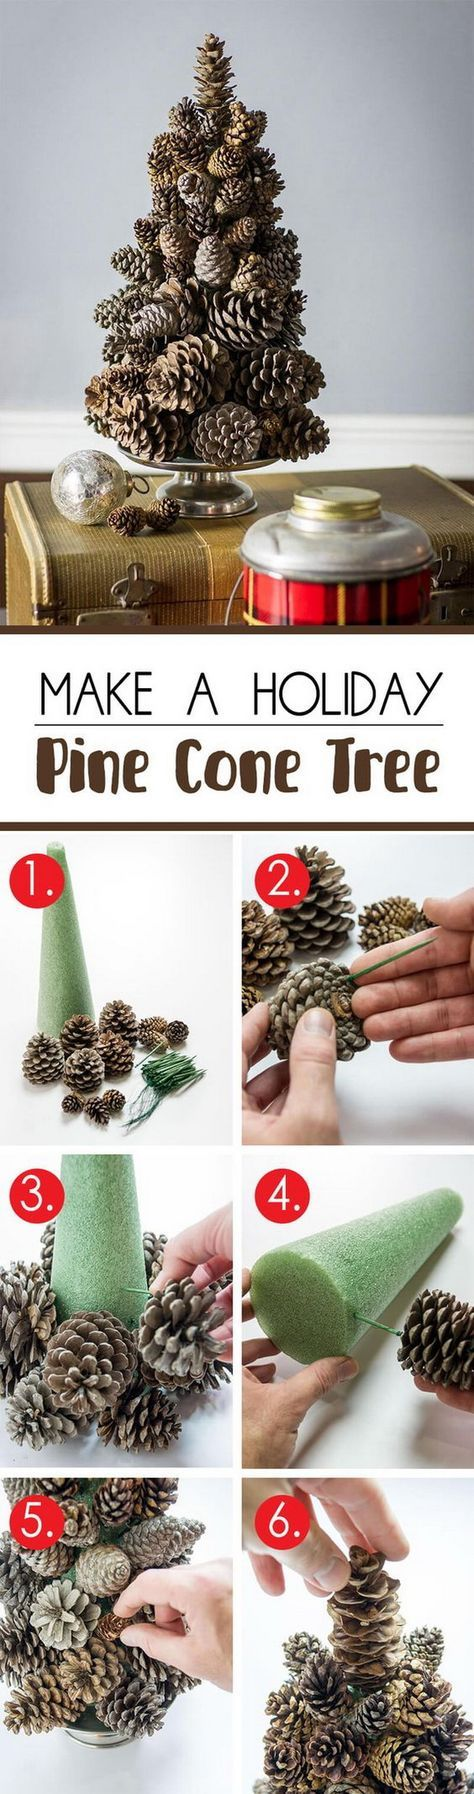 Holiday Pine Cone Tree.